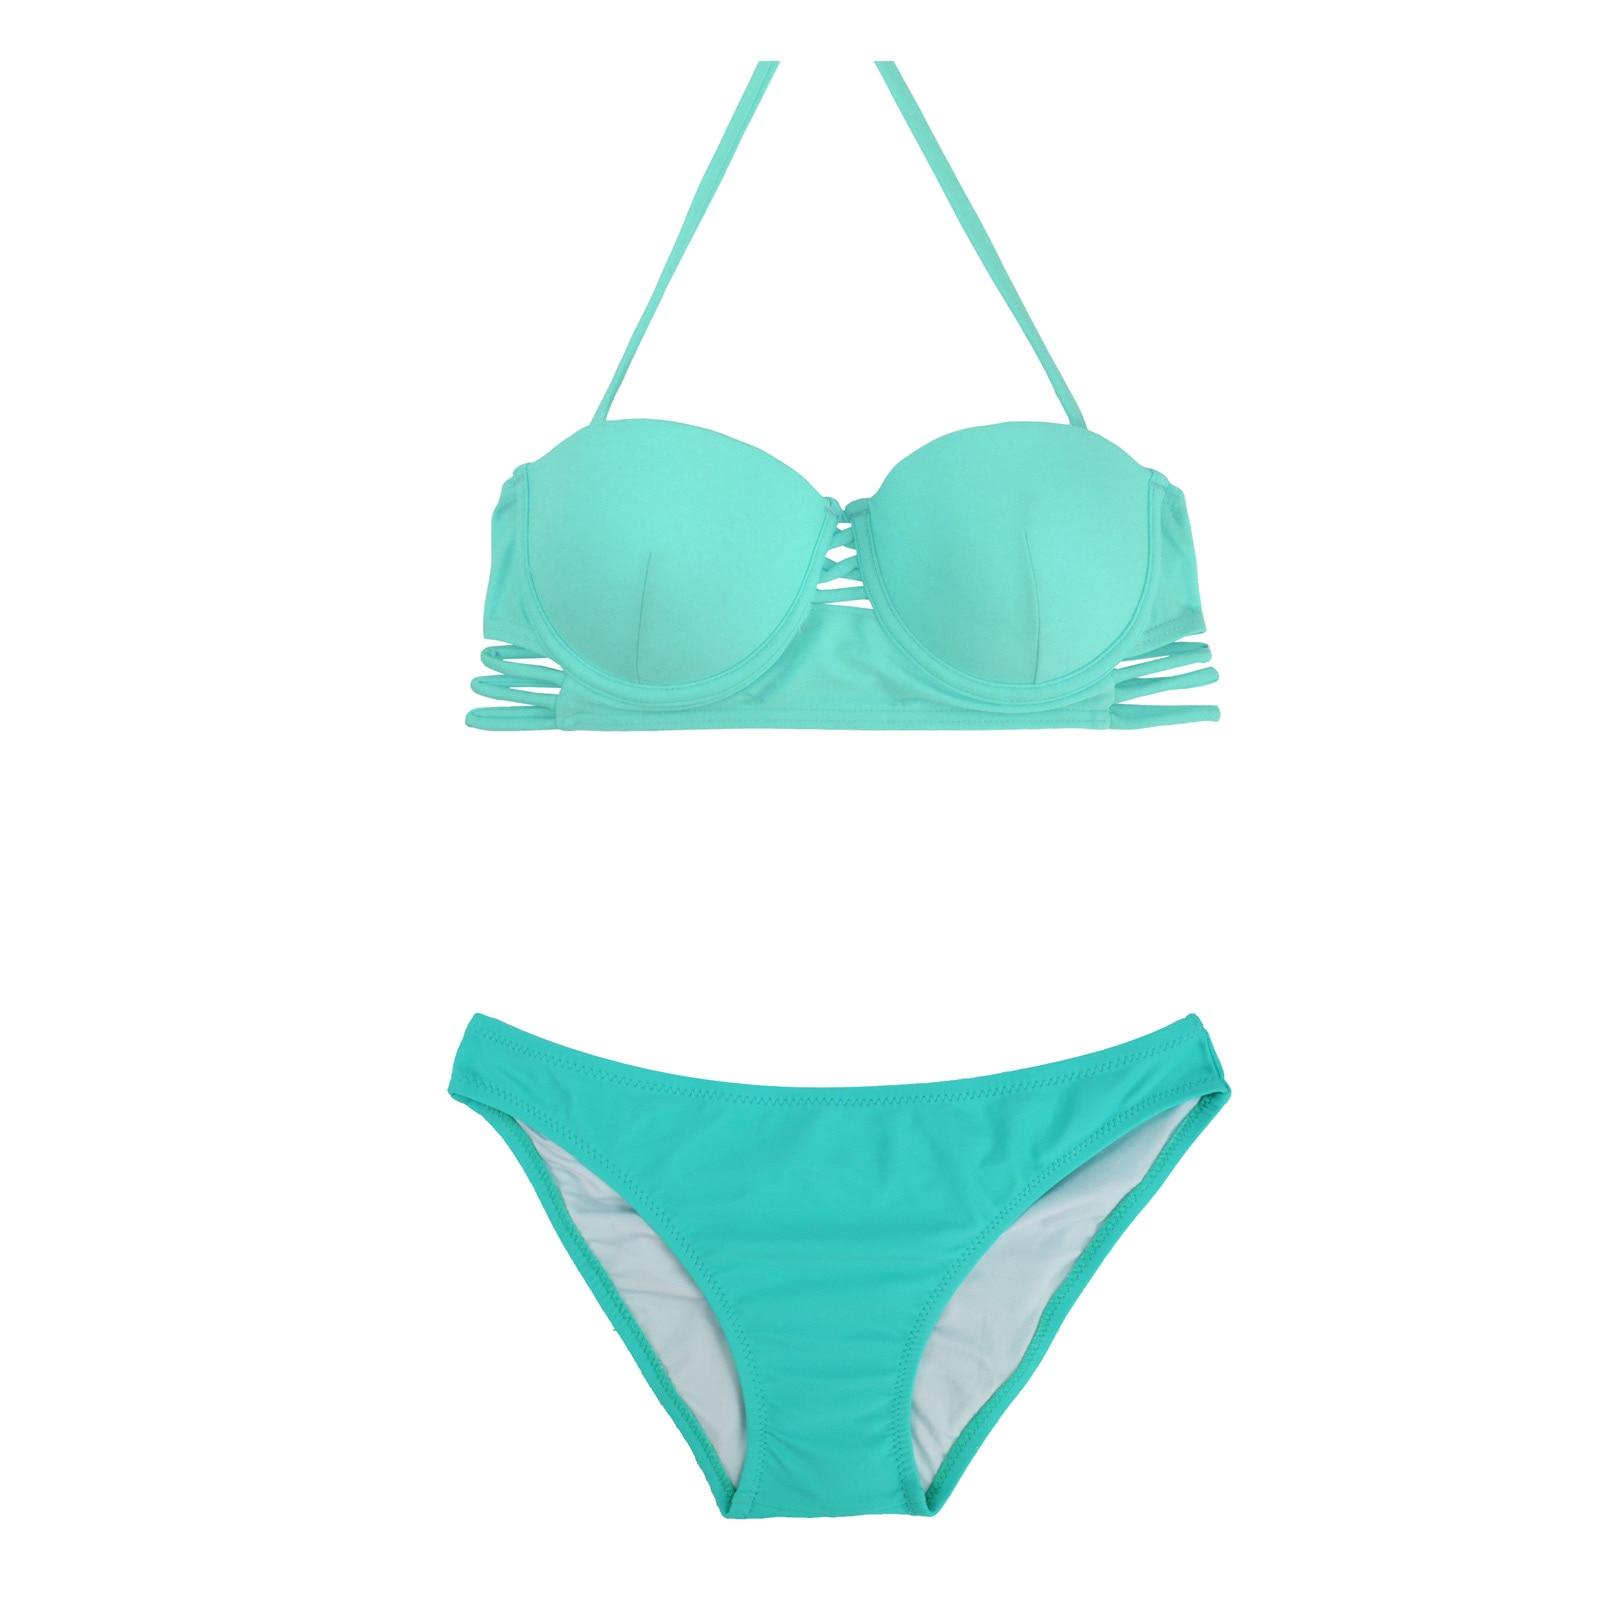 Low Waist Cutout Bikini Set 2016 Brazilian Halter Strappy Bathing Suit Push Up Swimwear Female Swimming For Women Beachwear